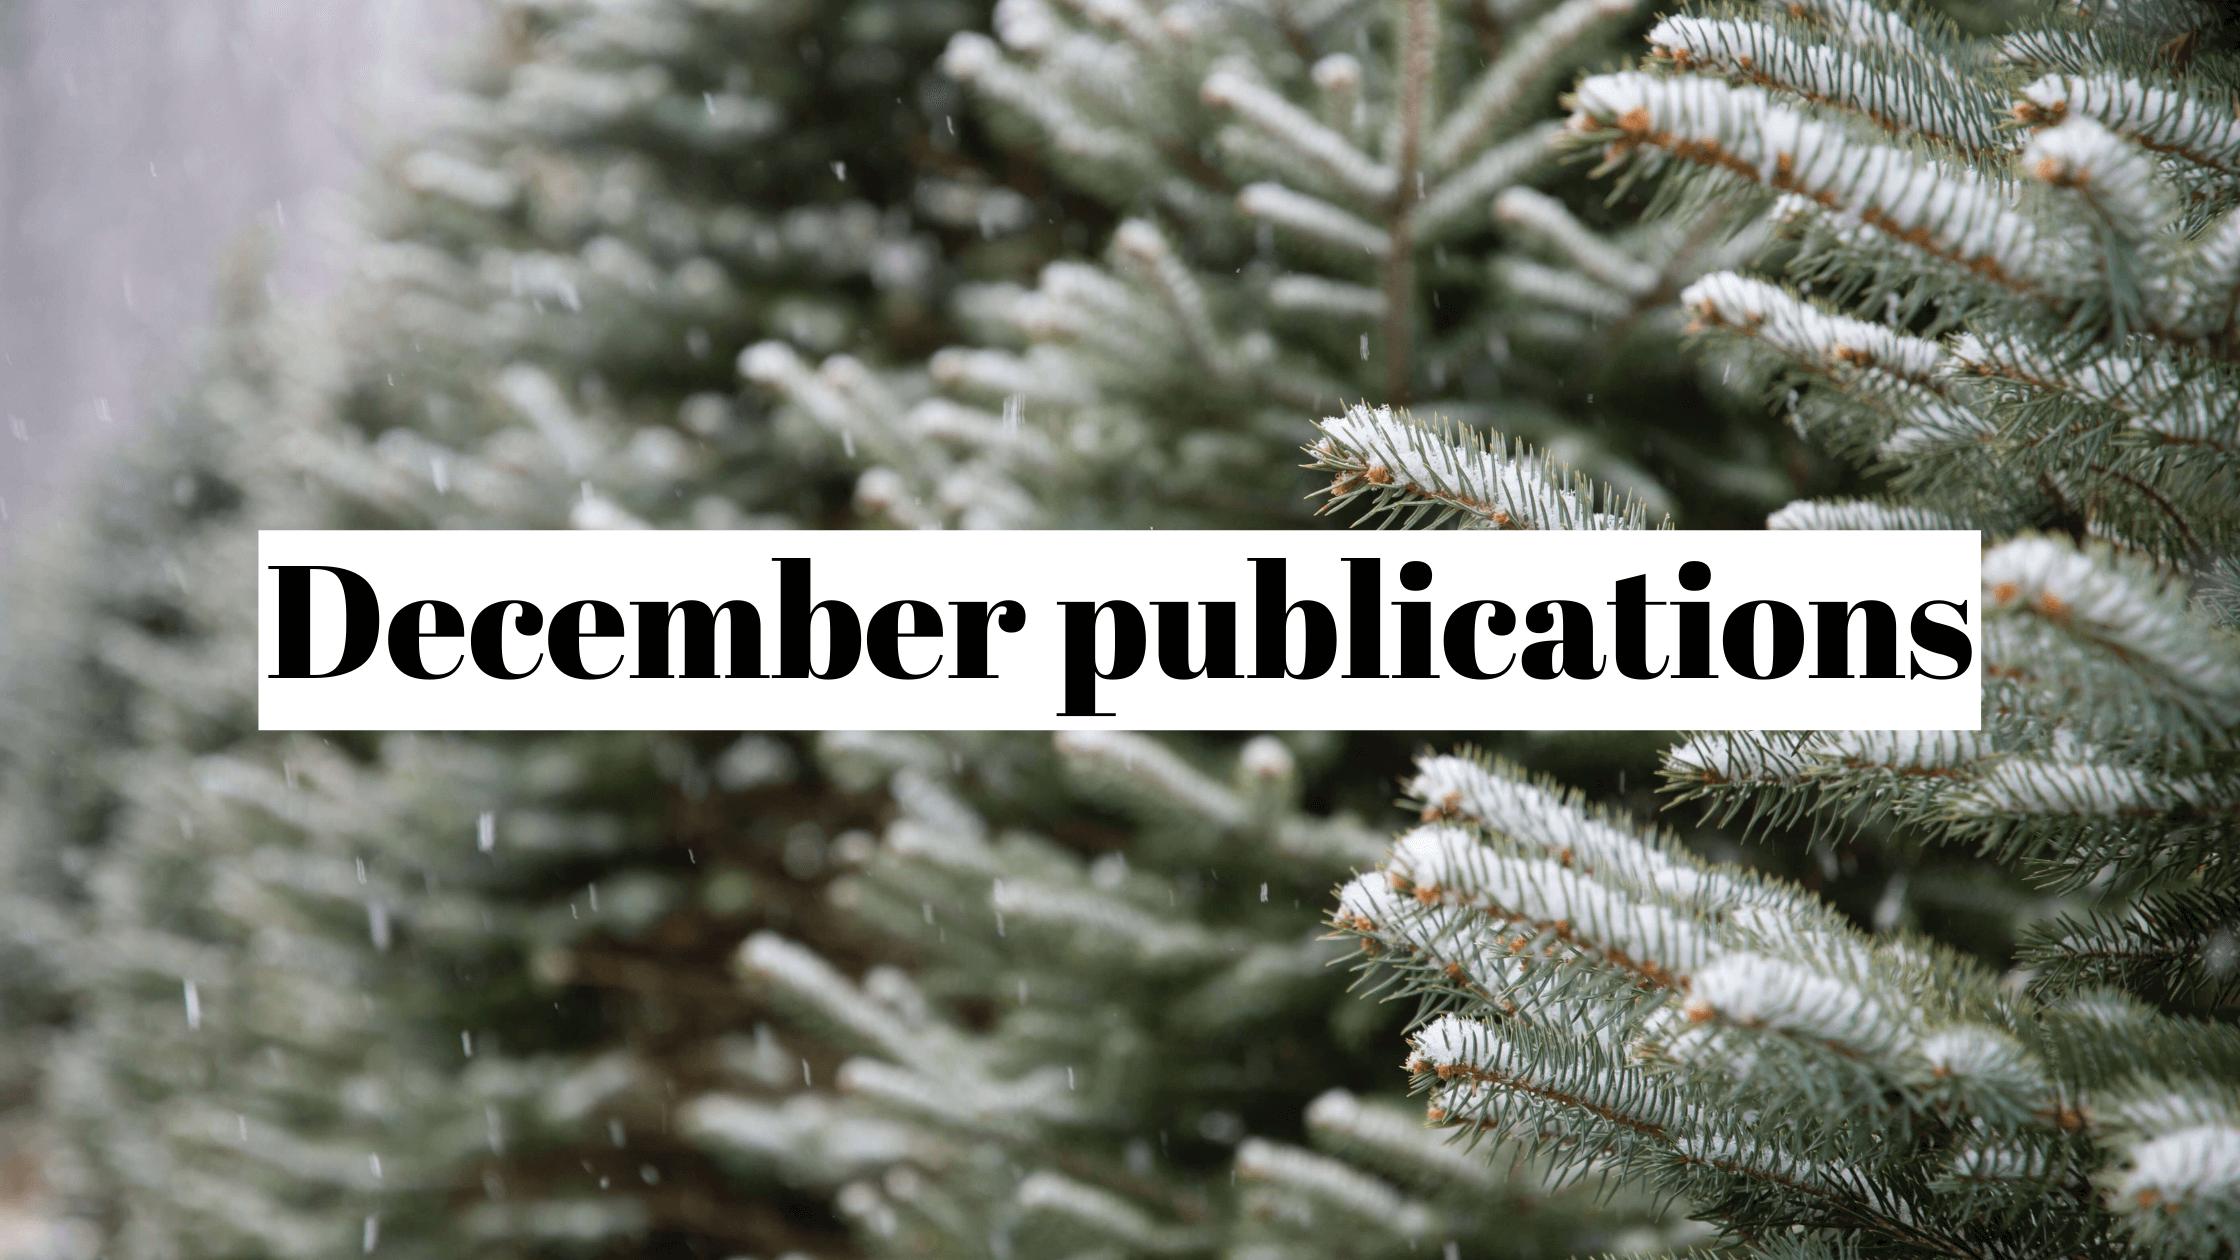 Last but not least of 2020: Truesix's December publicity recap